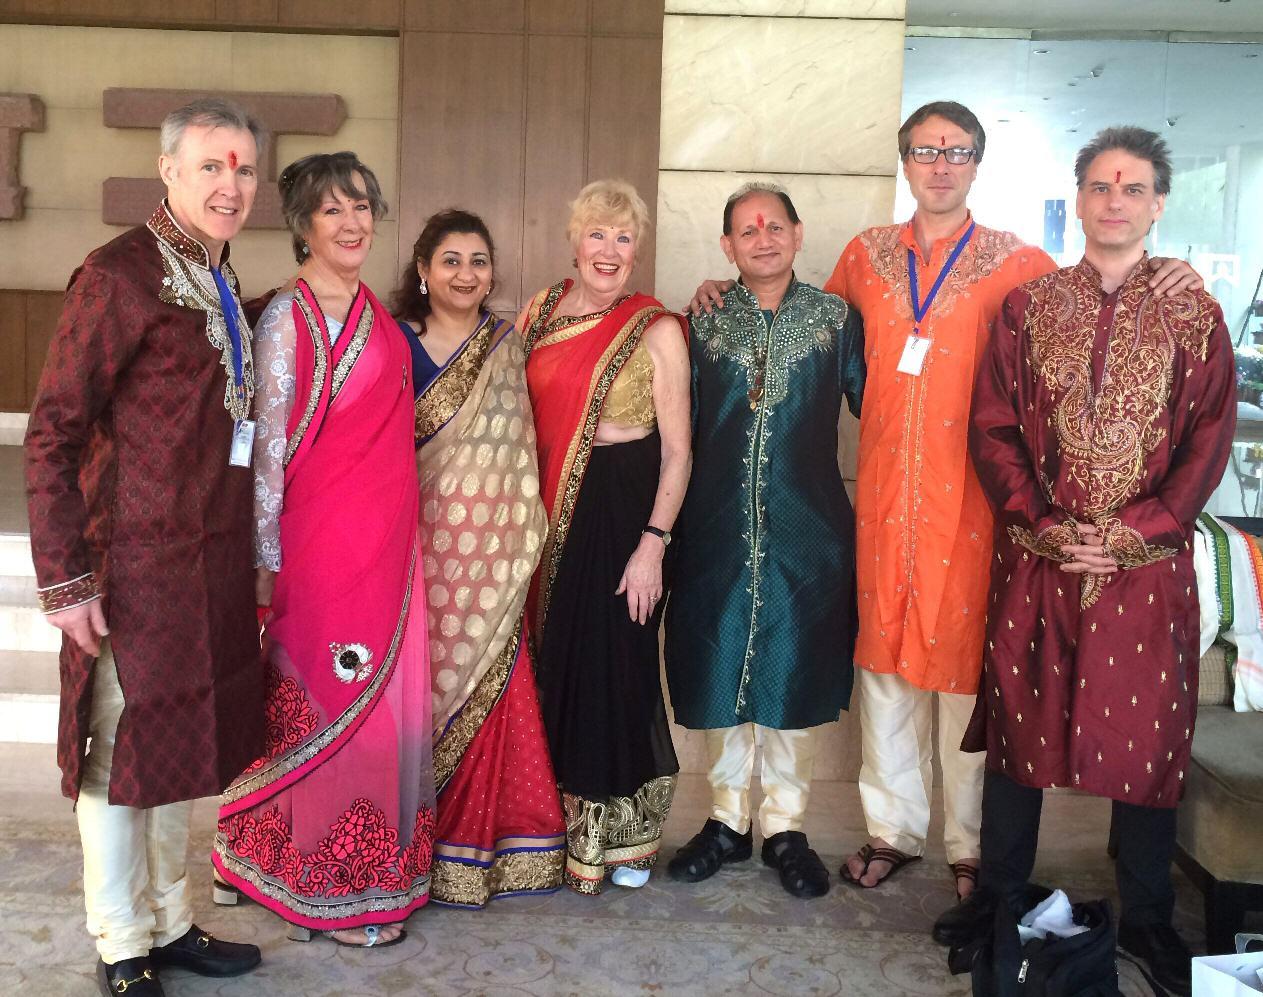 Astrologers dressed in Saris and Sherwanis